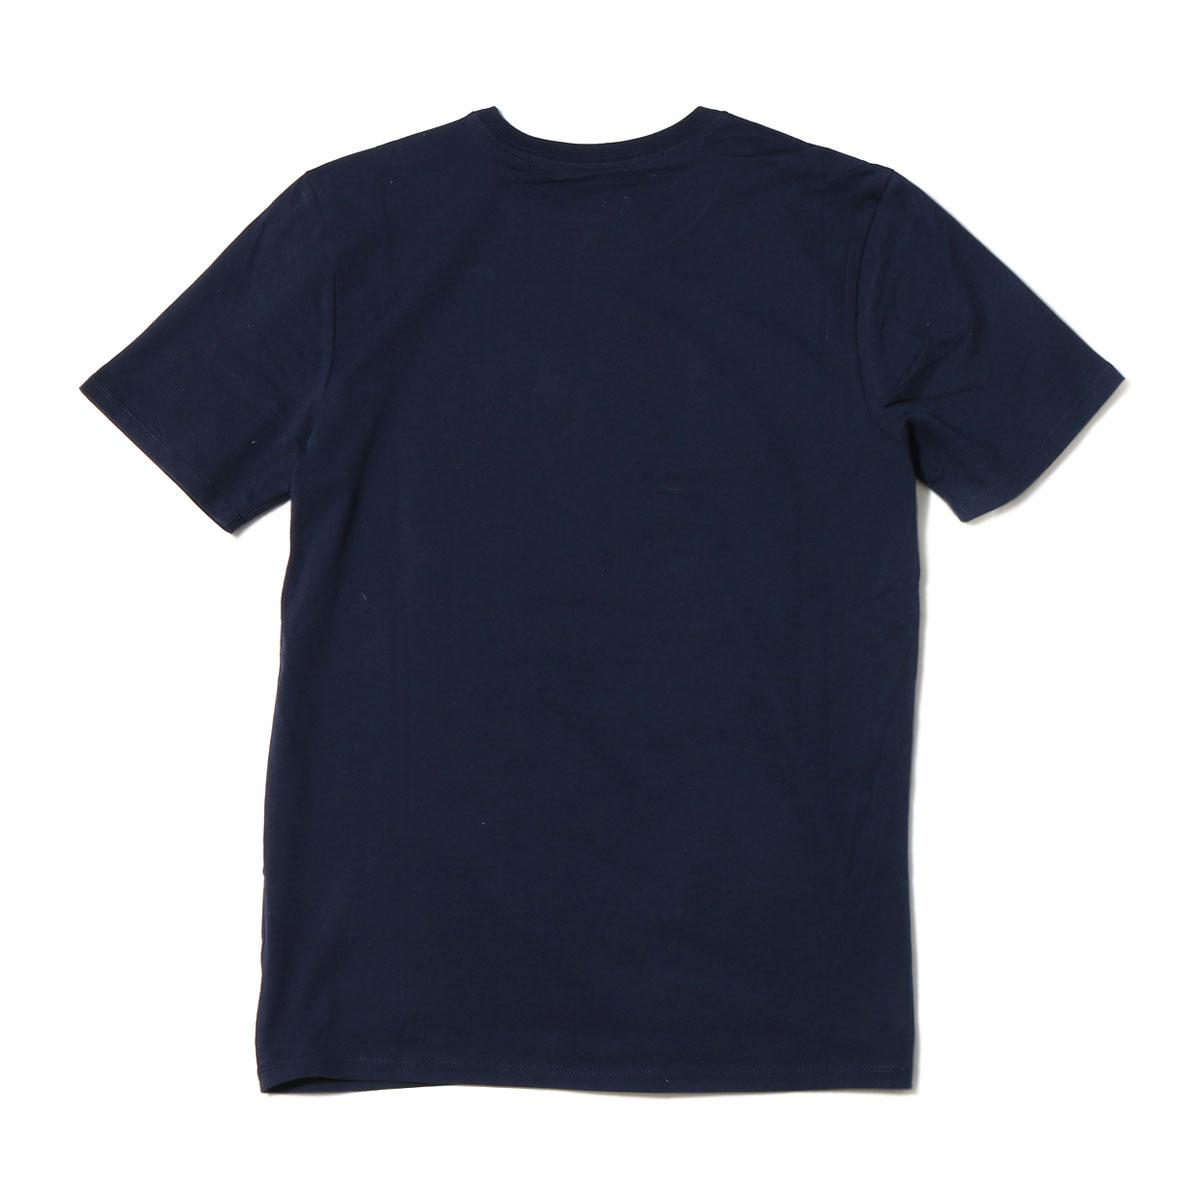 NIKE KISS MY AIR S/S TEE (Nike kiss Mai air S/S T-shirt) (OBSIDIAN) 17SP-S